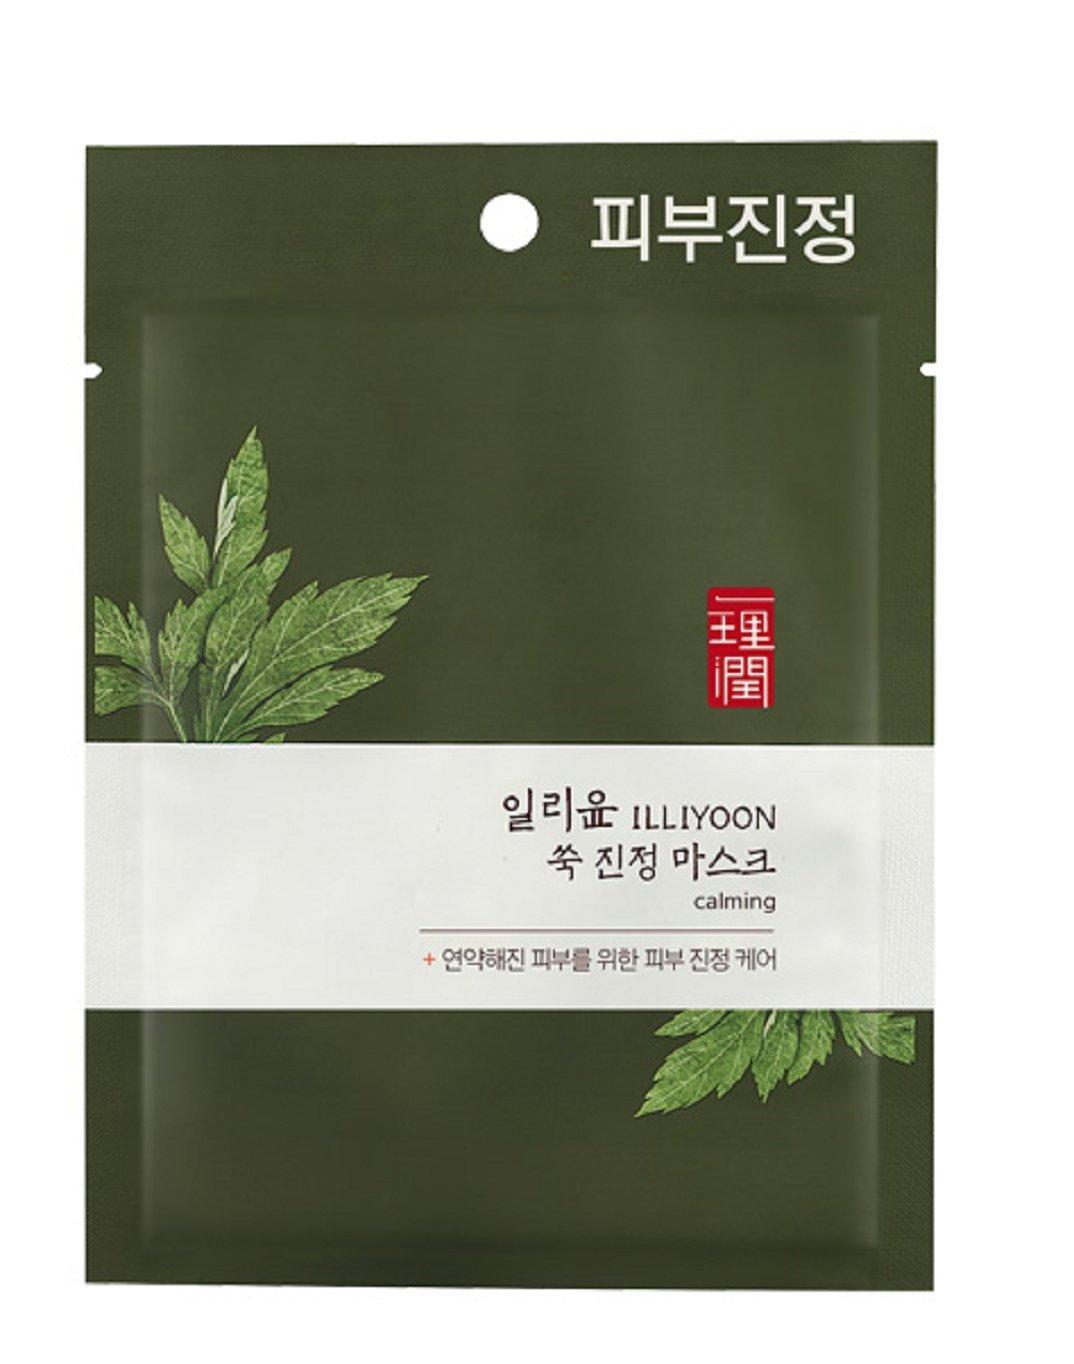 Illi Lotus Moisture Sheet Mask 10 Count Beauty Secret Key Nature Recipe Pack Tea Tree 20g 3pcs Mugwort Calming Of 12